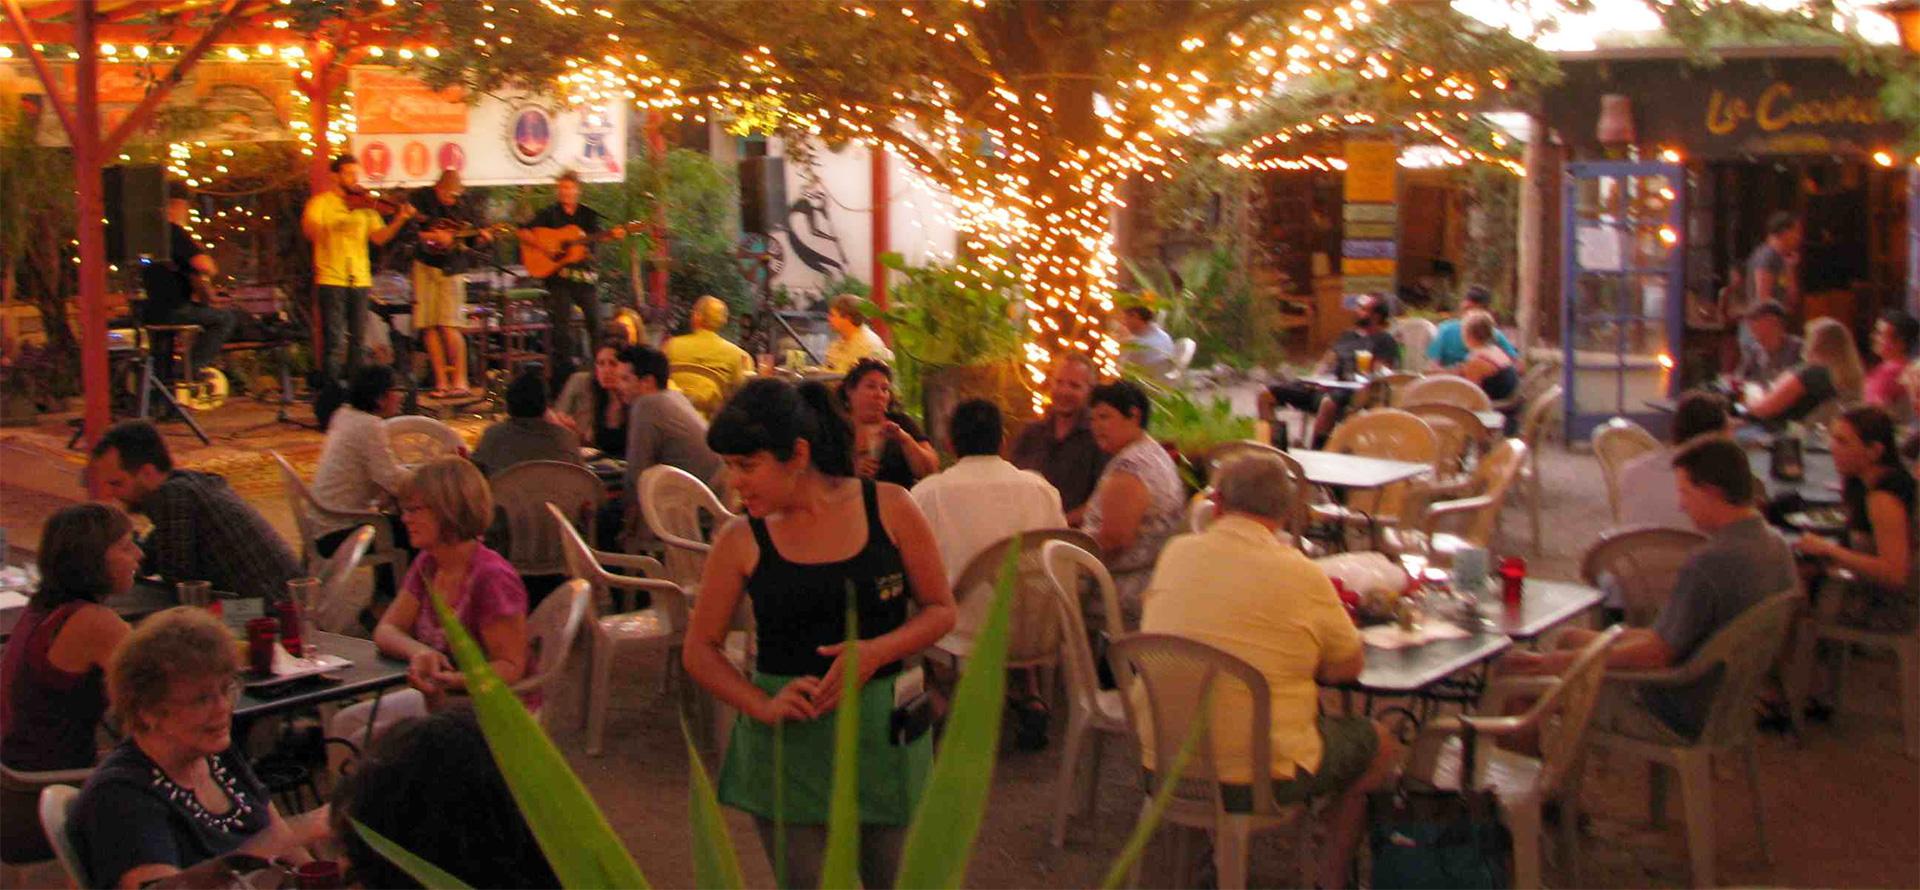 La Cocina  Downtown Tucson Restaurant Bar and Live Music